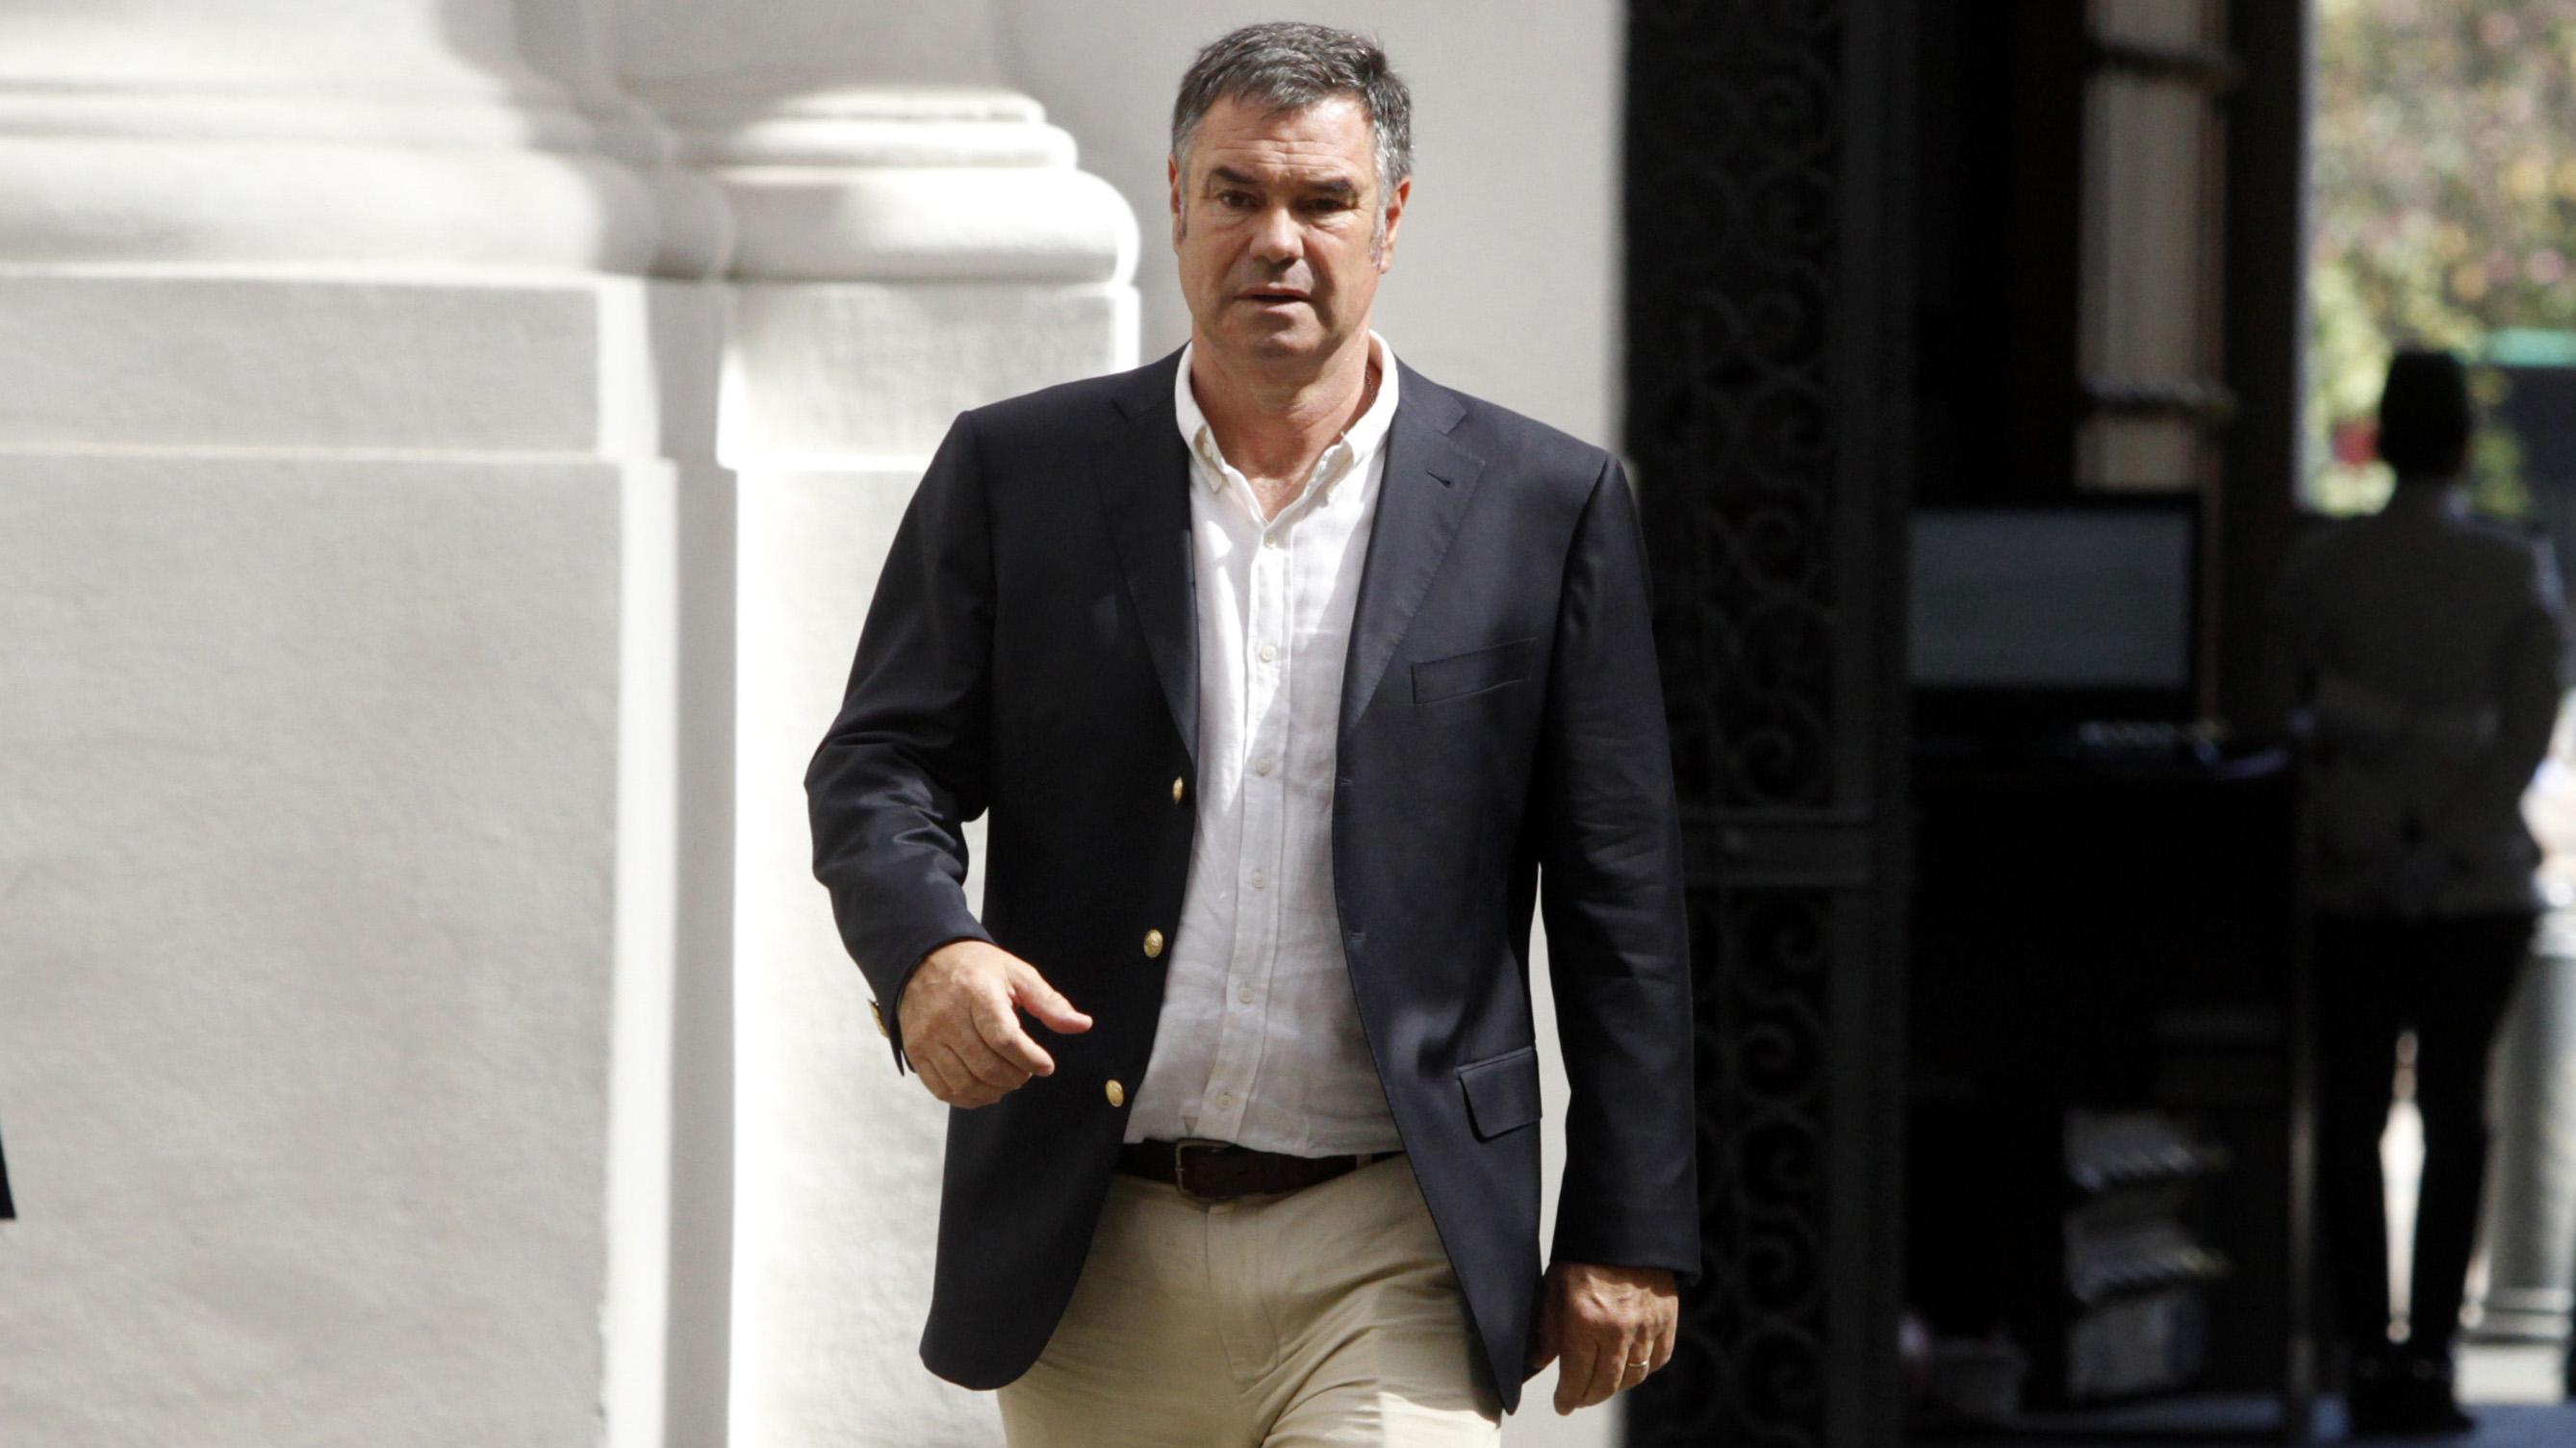 Ossandón ante eventual cambio de gabinete: Sacaría a ministra de Energía y mantendría a titular de Salud